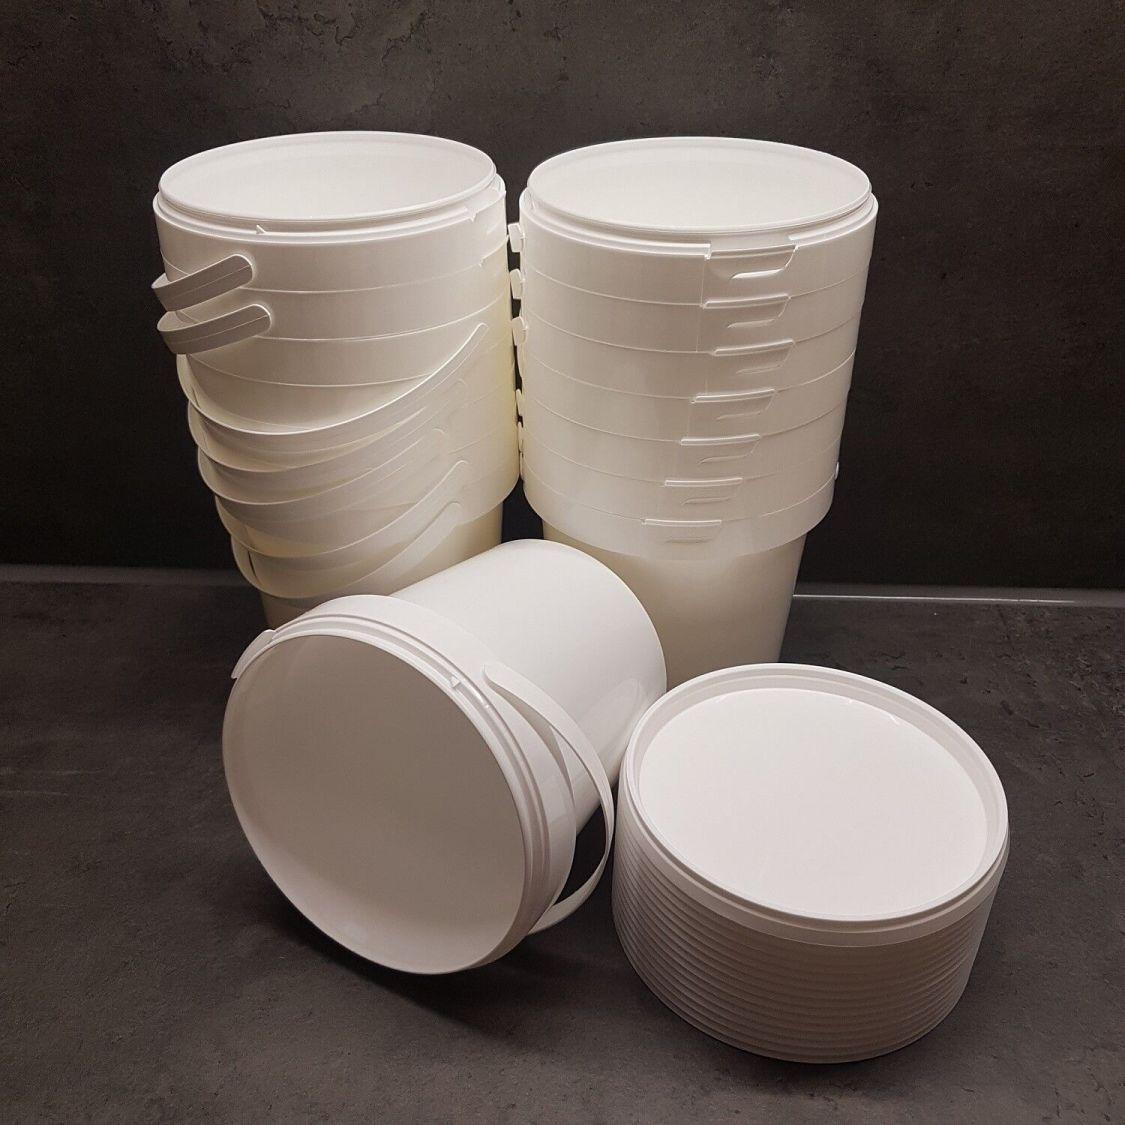 15 Stück Eimer weiss mit Deckel 1 Liter lebensmittelecht Neuware Kunststoffeimer